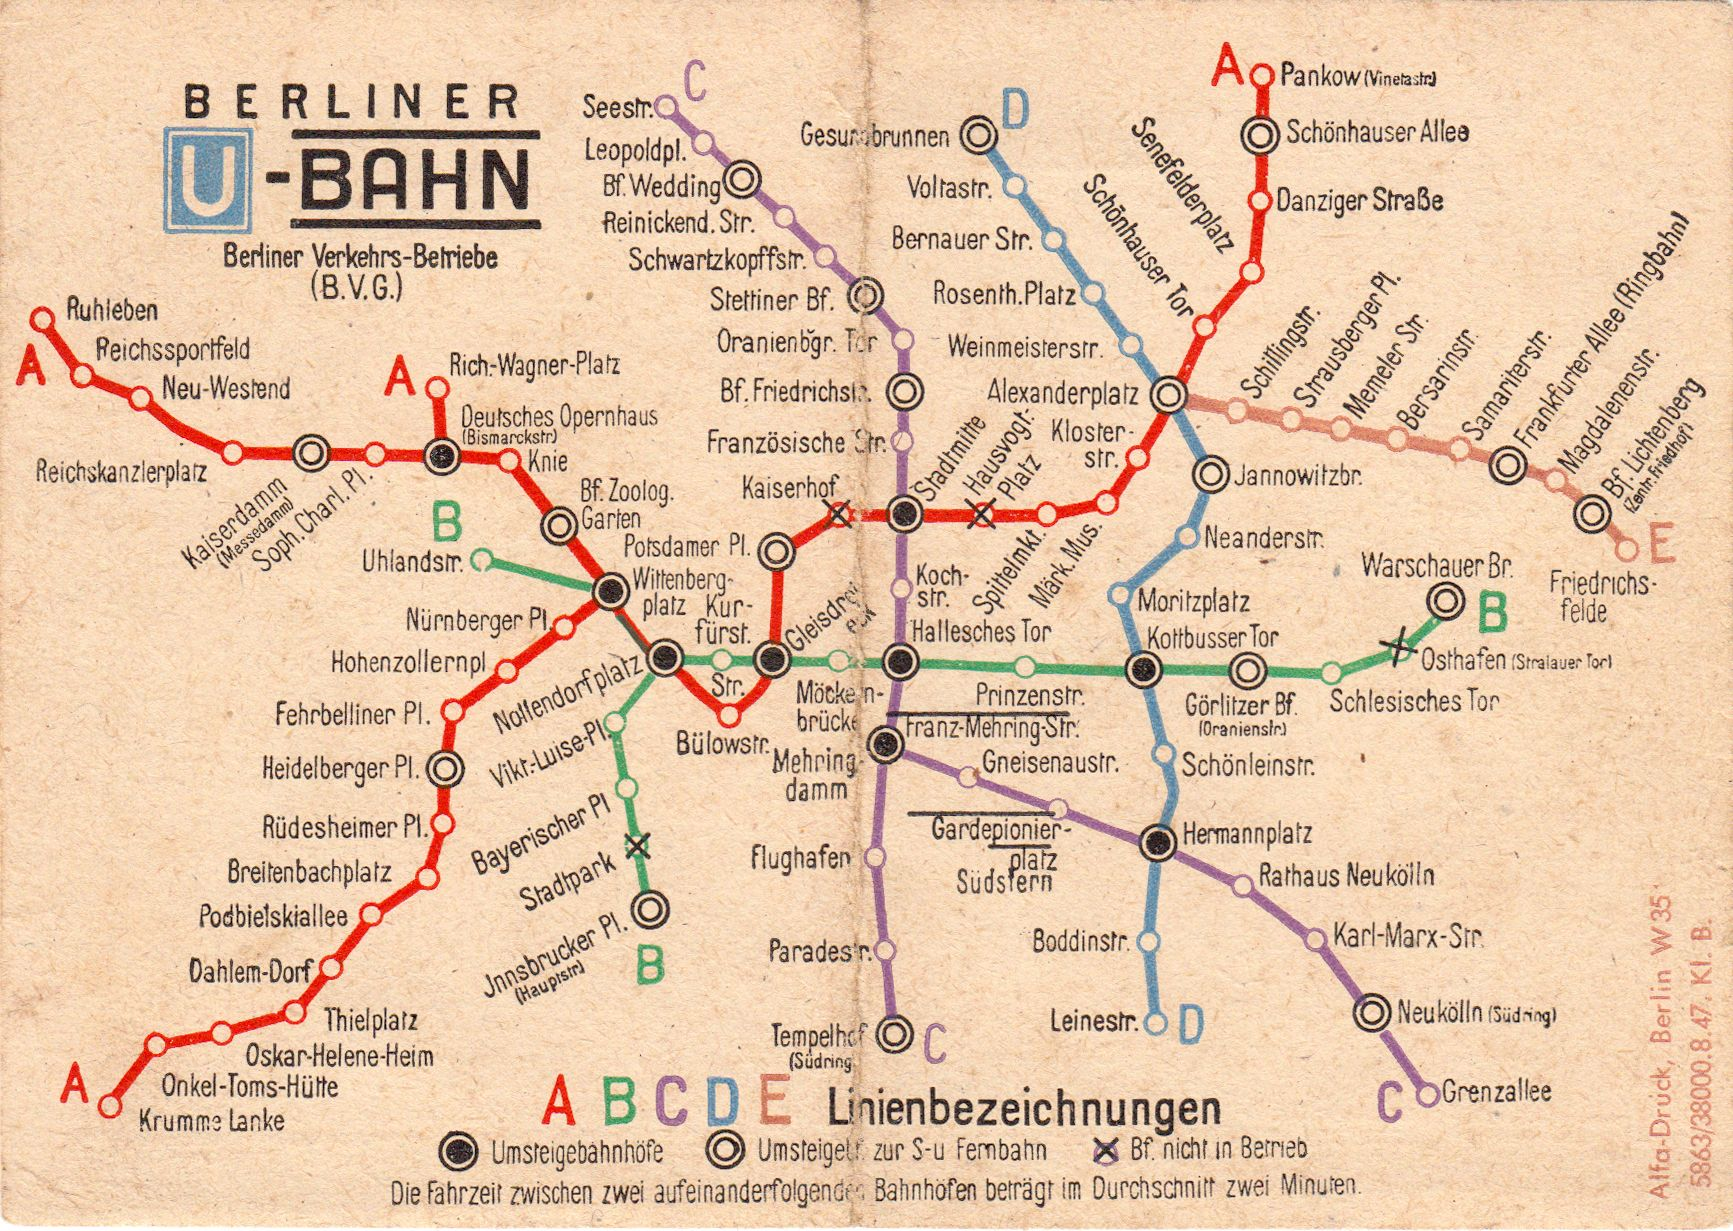 U Bahn Berlin 1948 U Bahn Berlin Ubahn Stadtplan Berlin